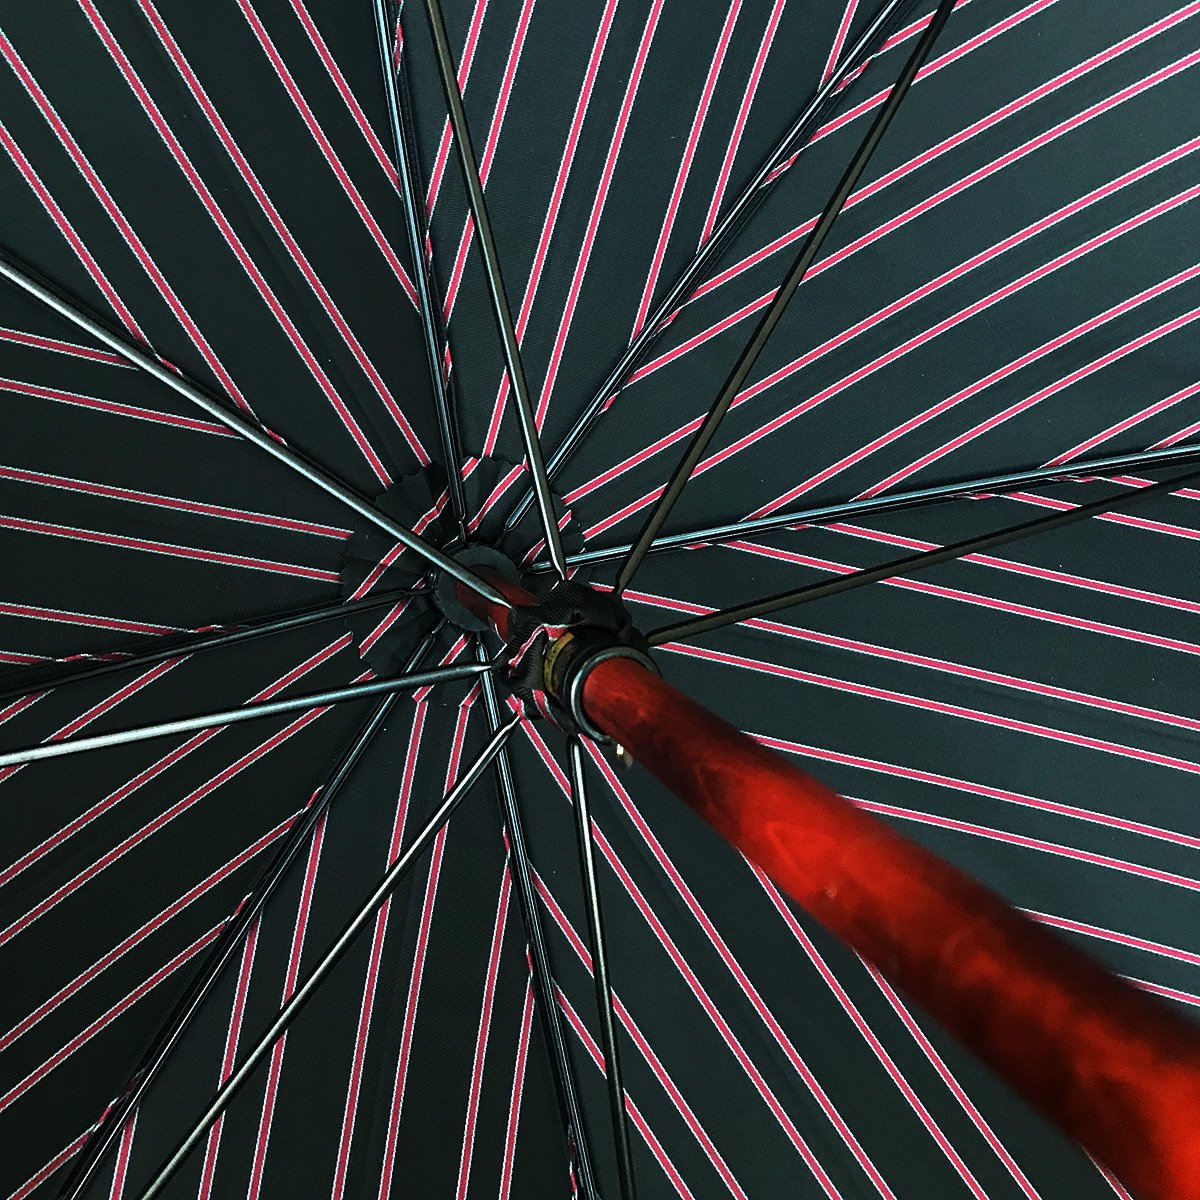 Wフェイス ストライプ 折りたたみ傘 詳細画像9